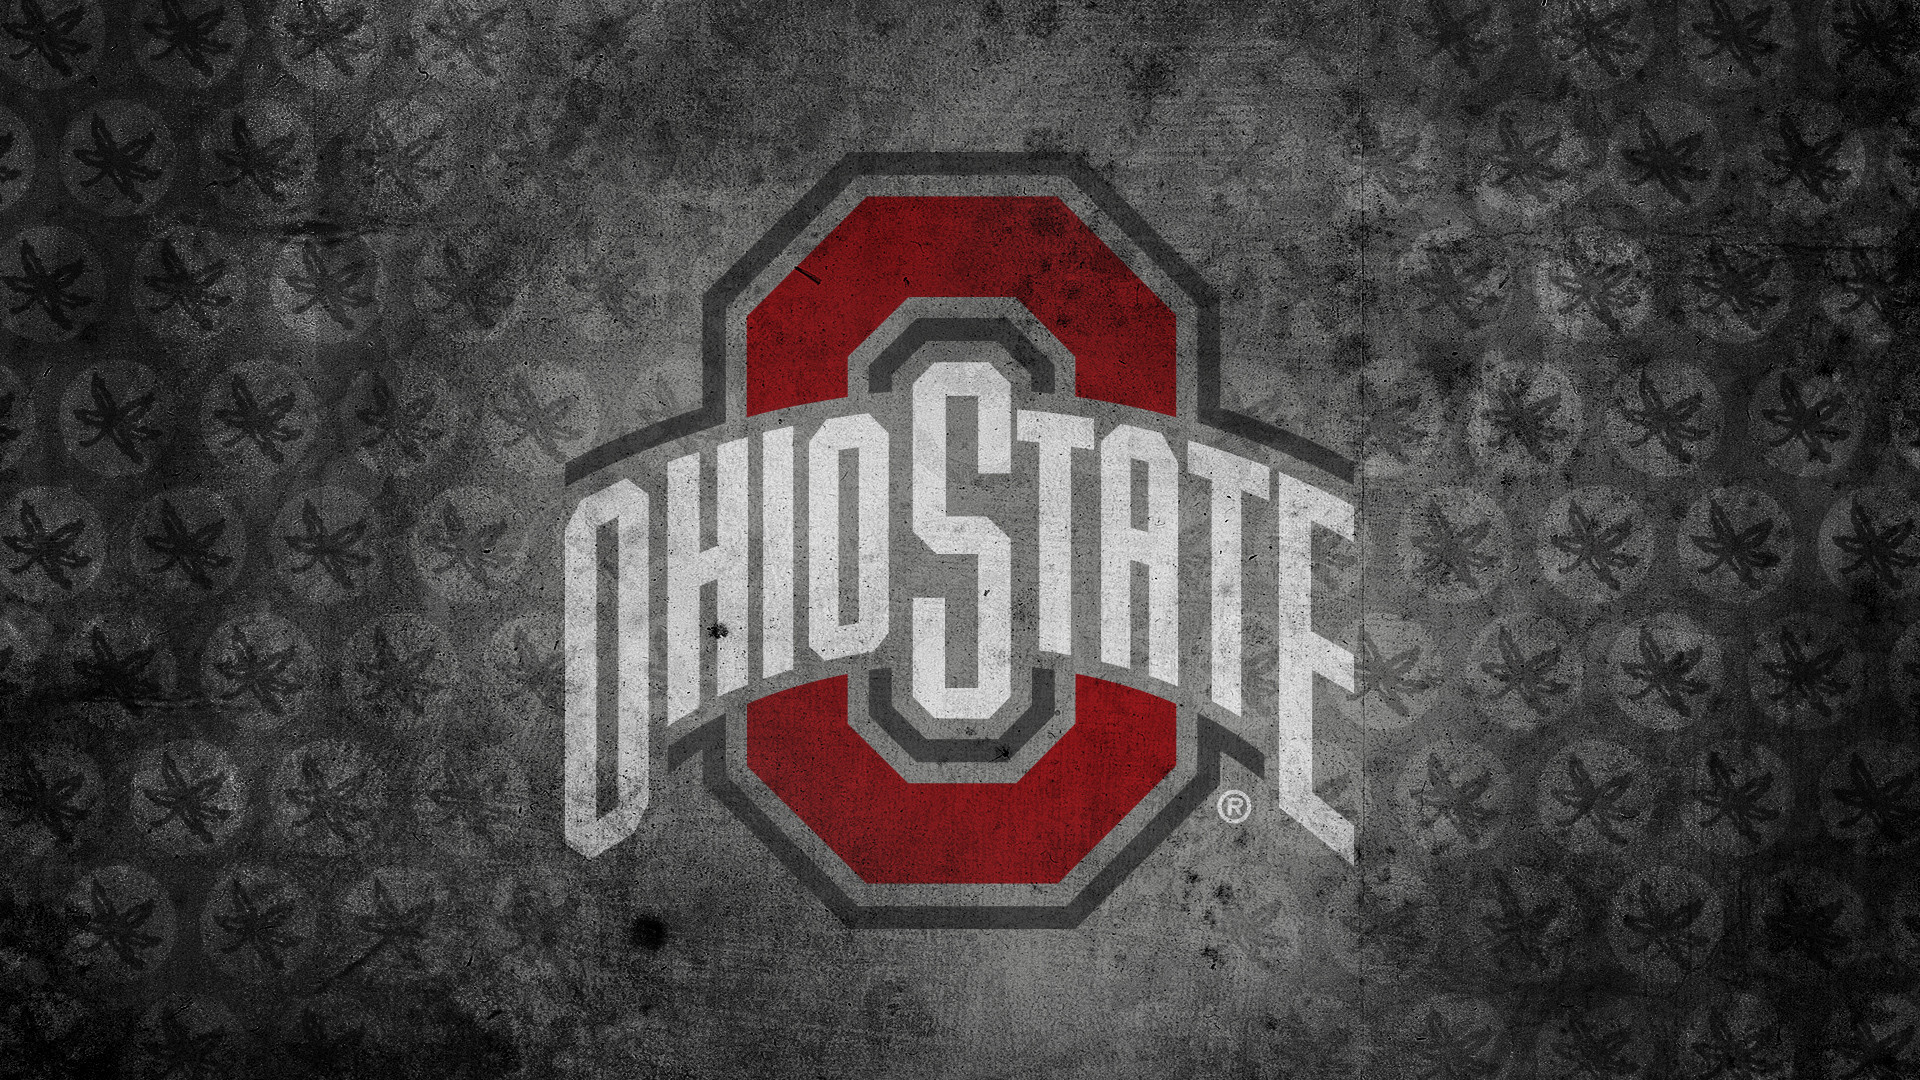 Ohio State Logo Wallpaper: Ohio State Buckeyes Background (70+ Images